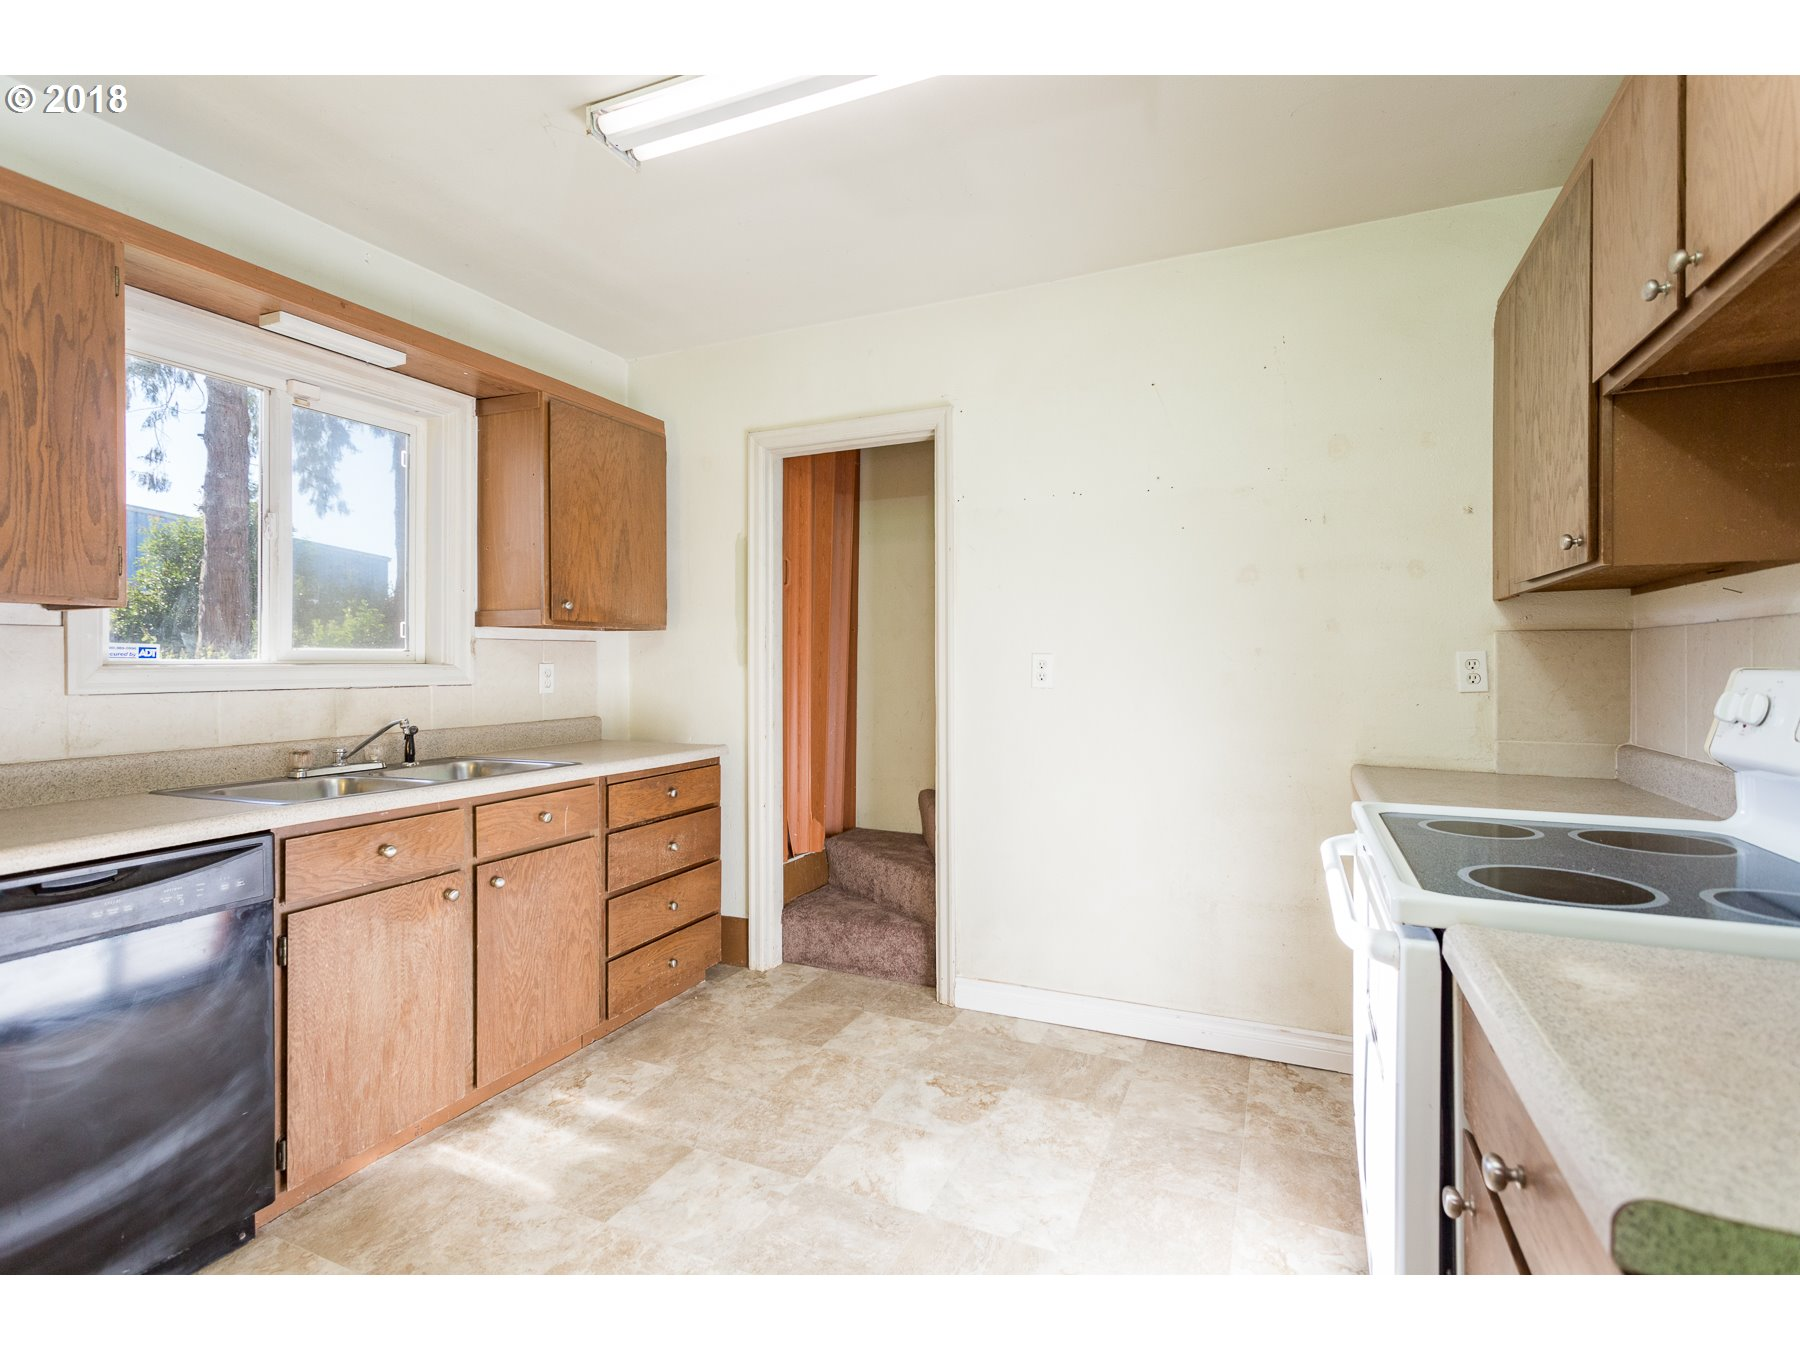 866 W MAIN ST Hillsboro, OR 97123 - MLS #: 18437300